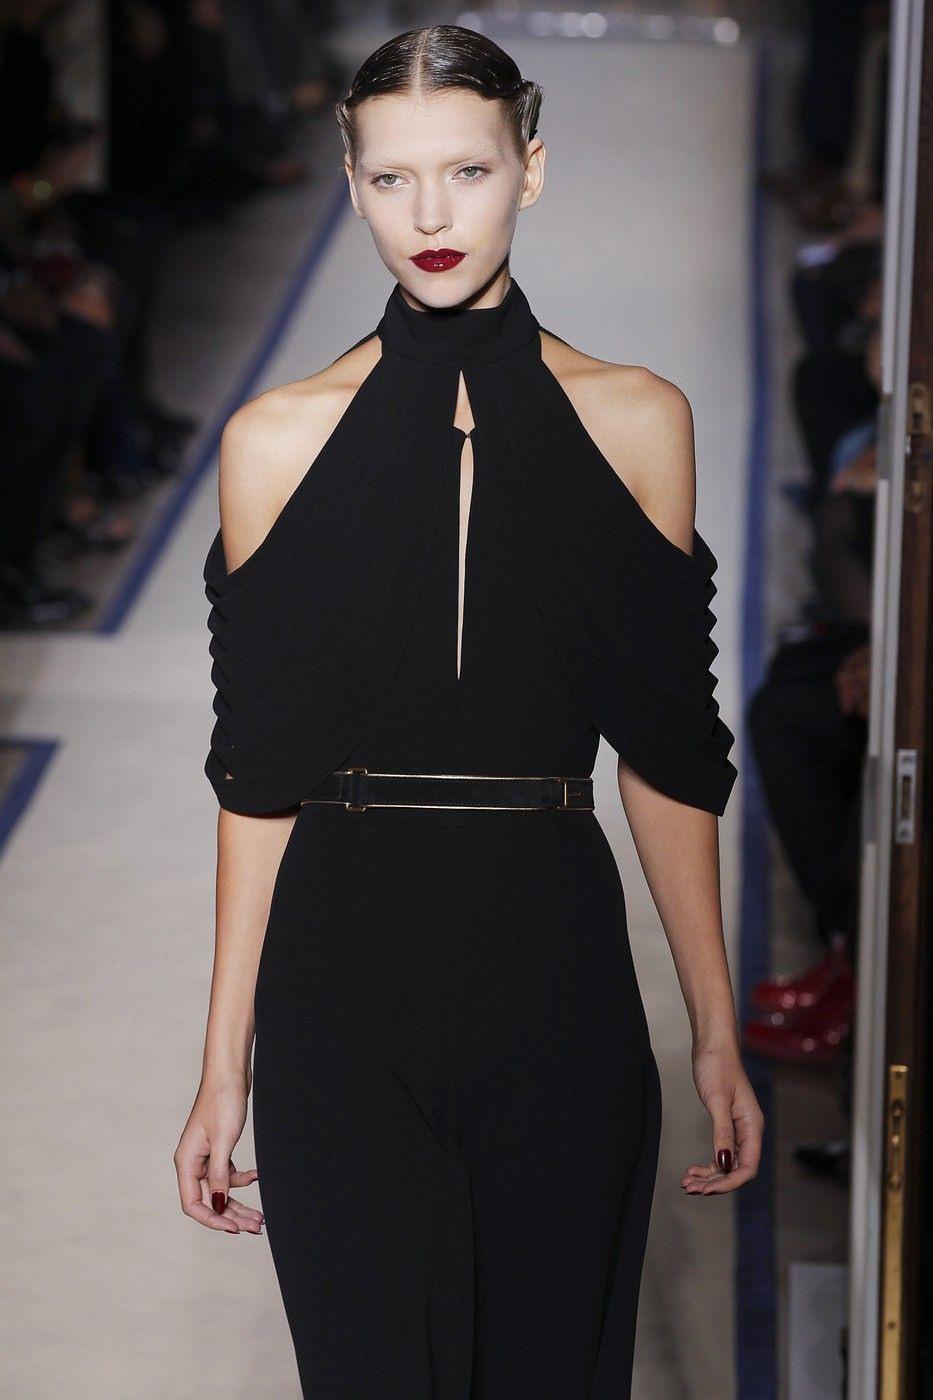 17 Wunderbar Abendkleider Yves Saint Laurent Boutique15 Schön Abendkleider Yves Saint Laurent Galerie